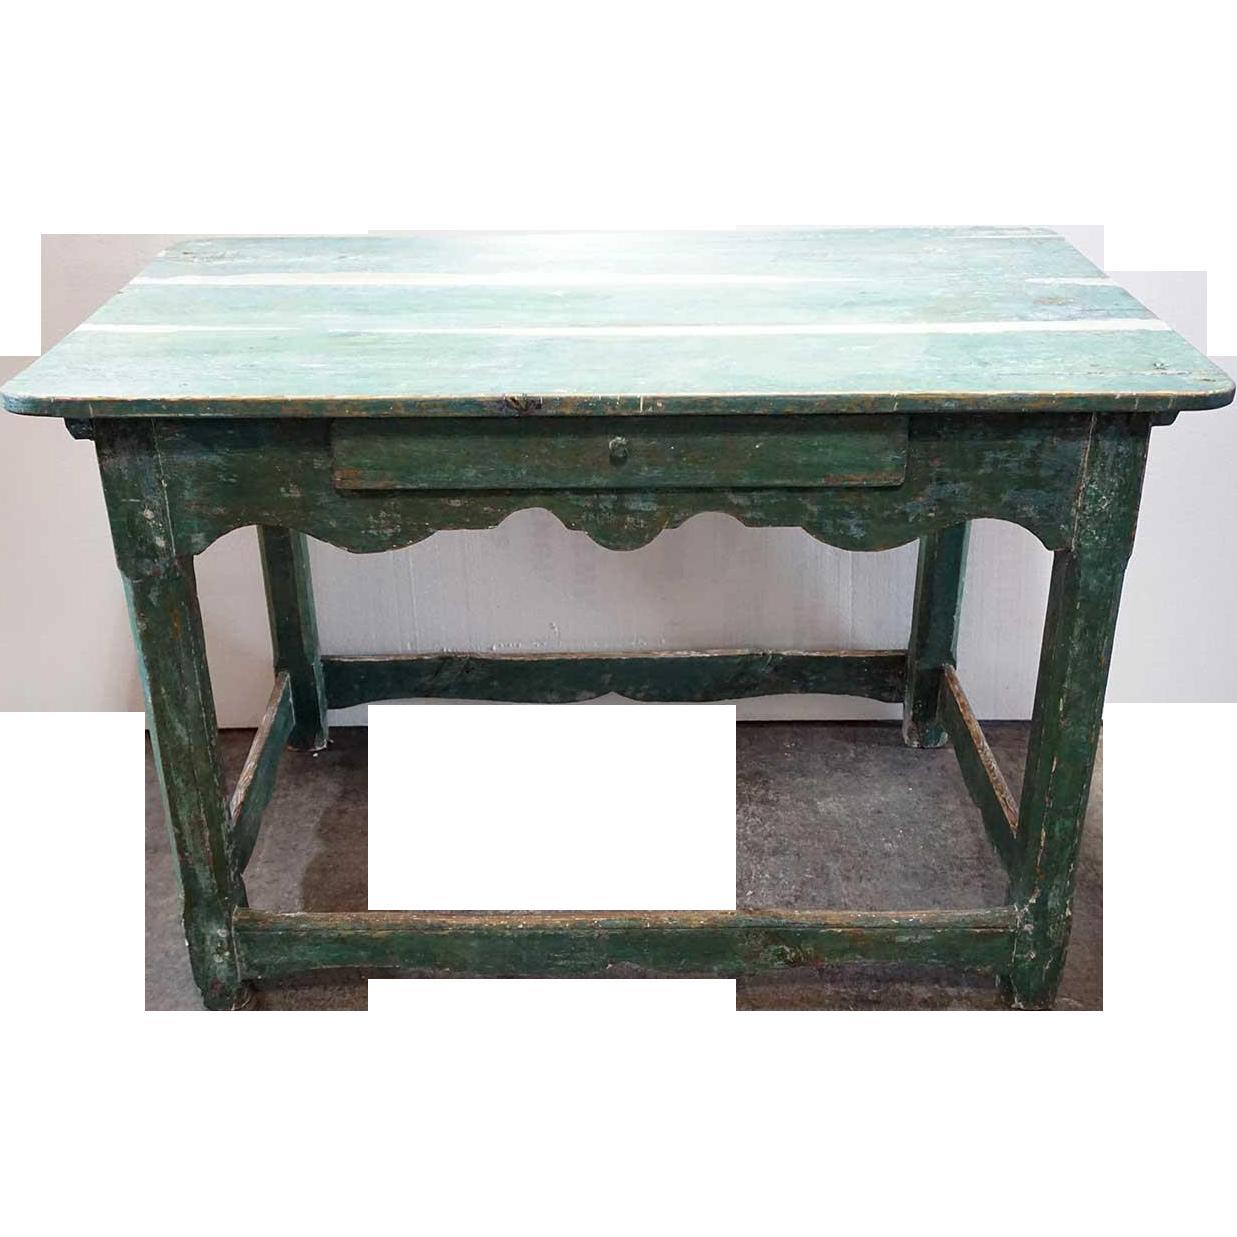 Scandinavian painted pine kitchen work table from eronjohnsonantiques on ruby lane - Scandinavian kitchen table ...